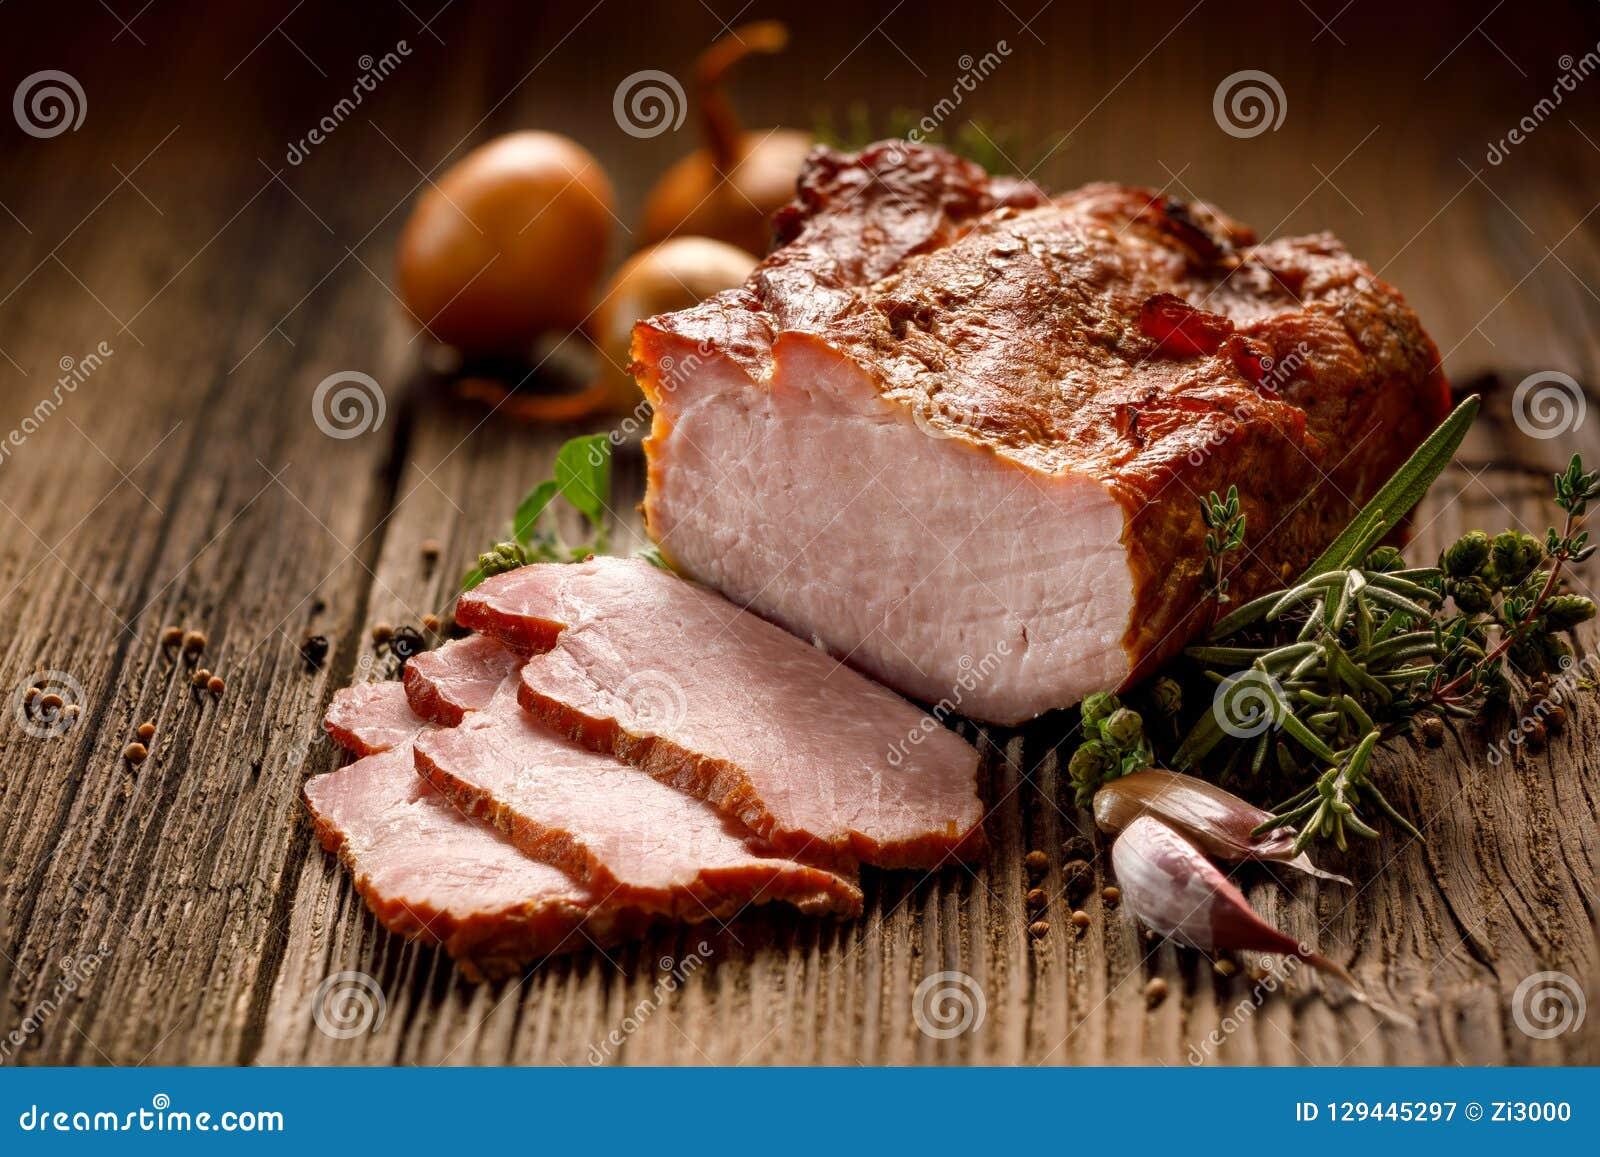 Carni affumicate, lonza di maiale affumicata affettata su una tavola di legno con l aggiunta delle erbe fresche e spezie aromatic